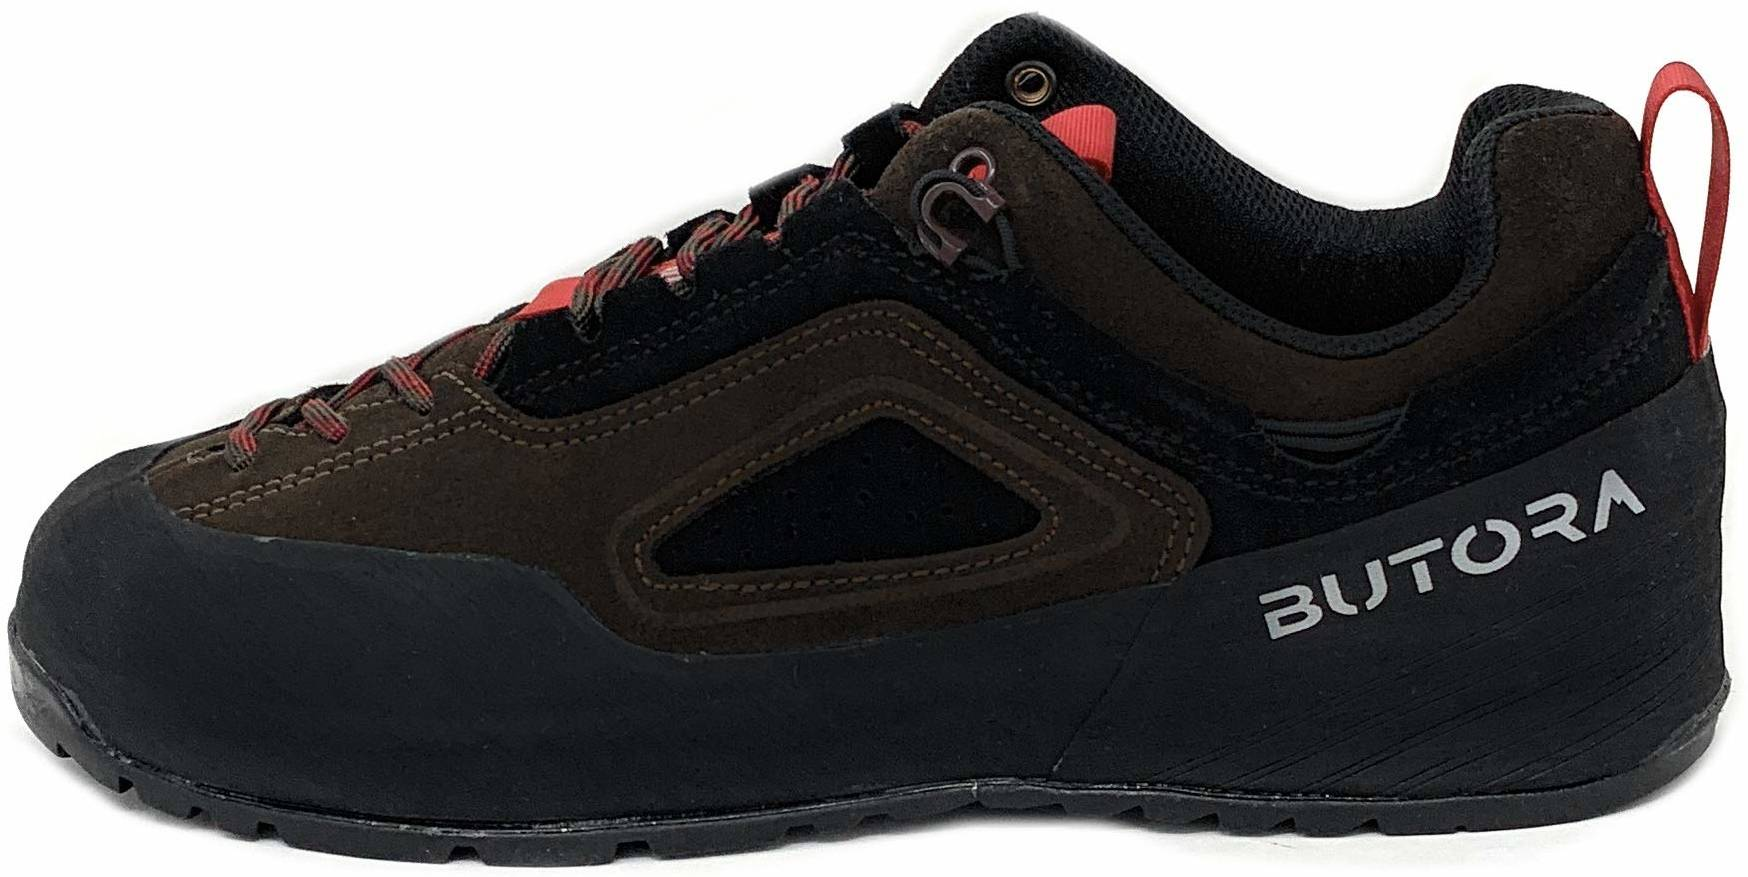 Butora Men/'s Wing Approach Shoes